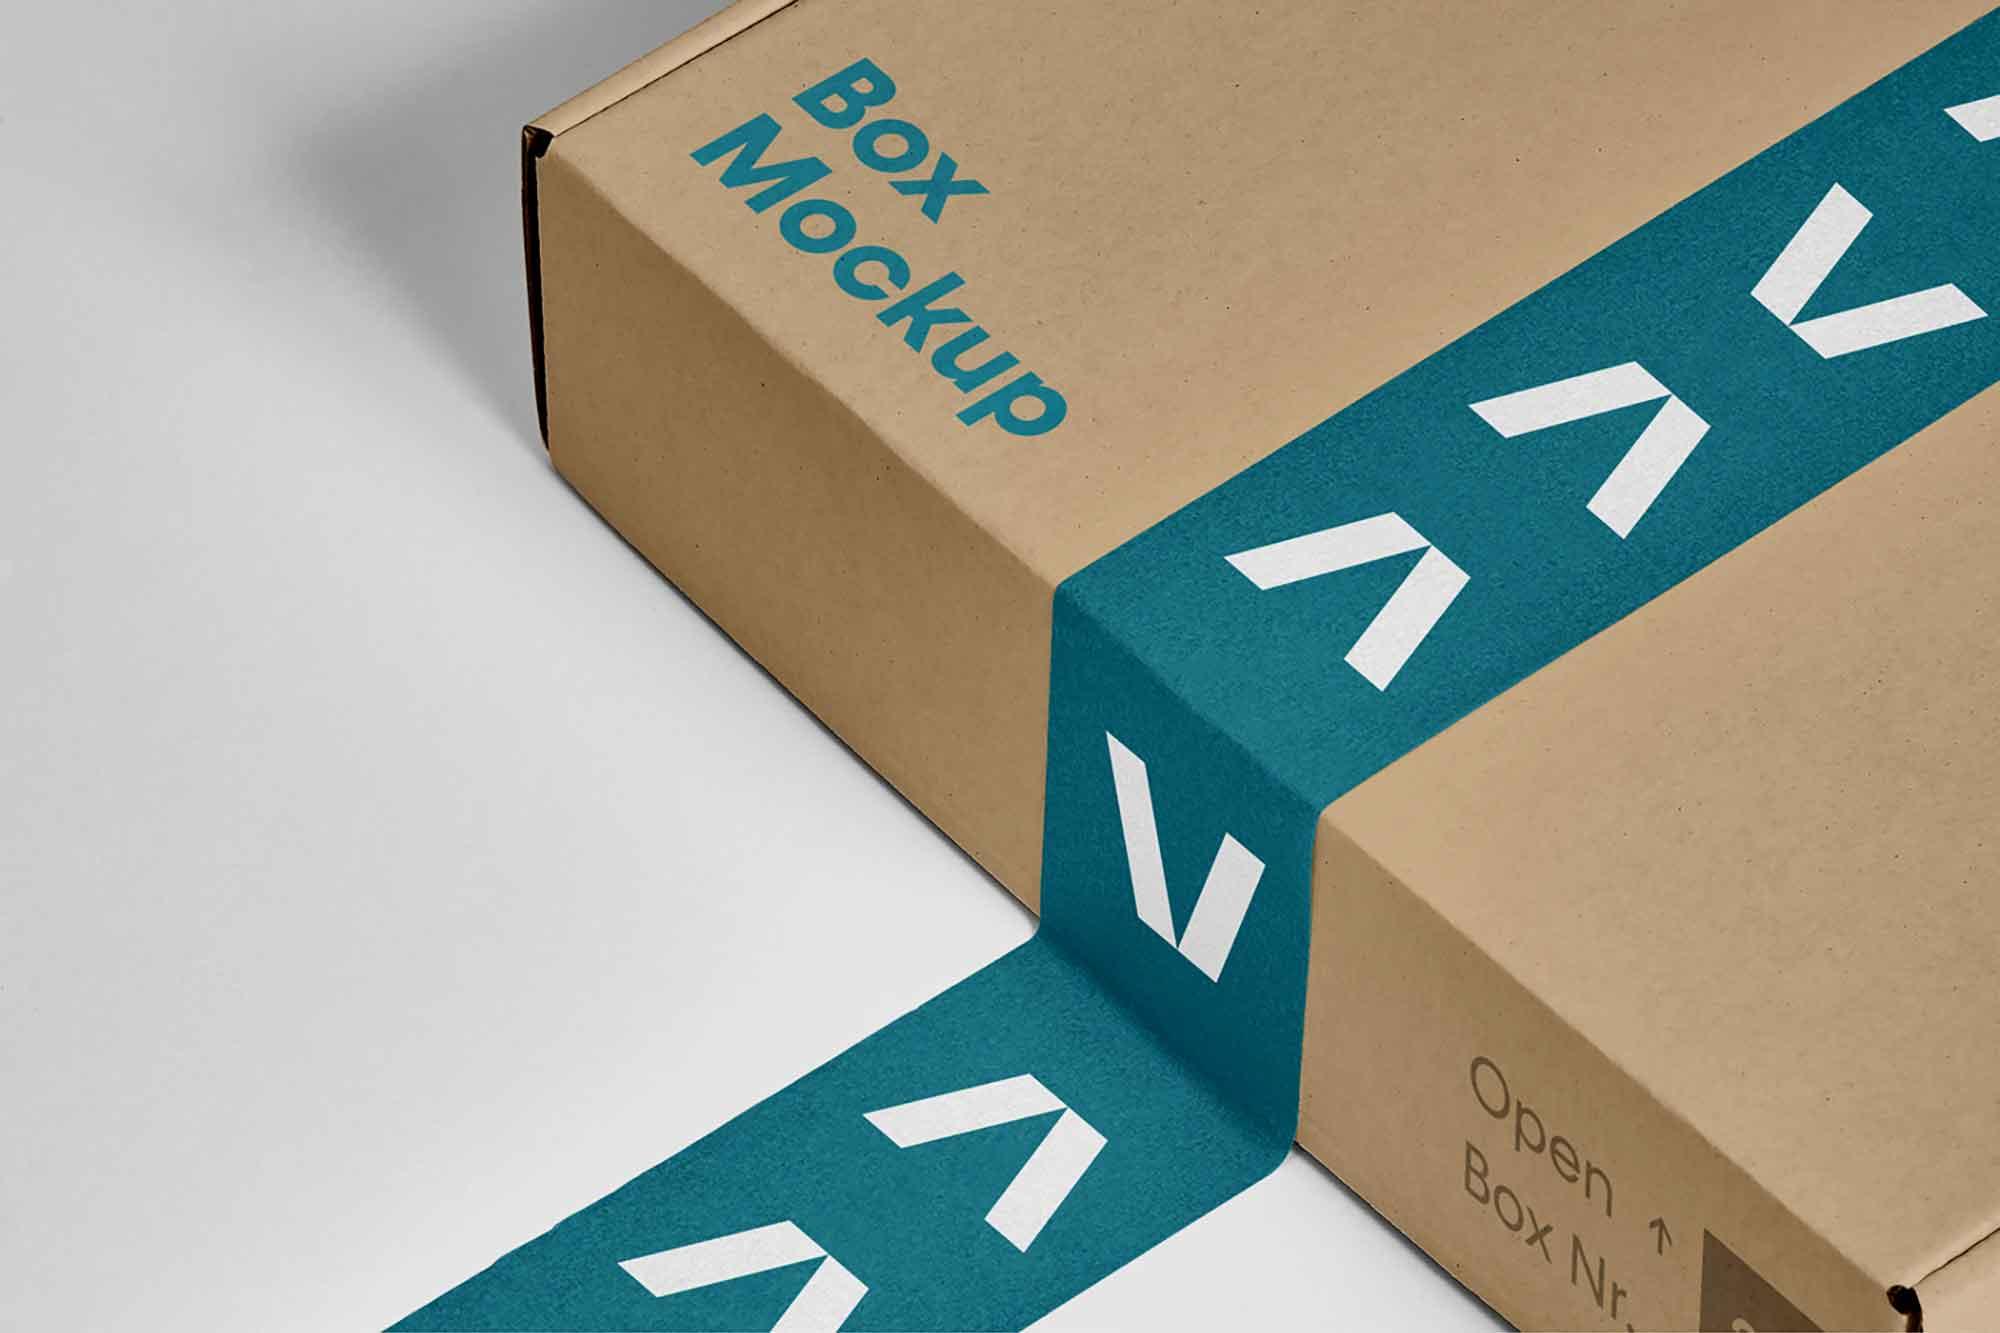 Box with Tape Mockup